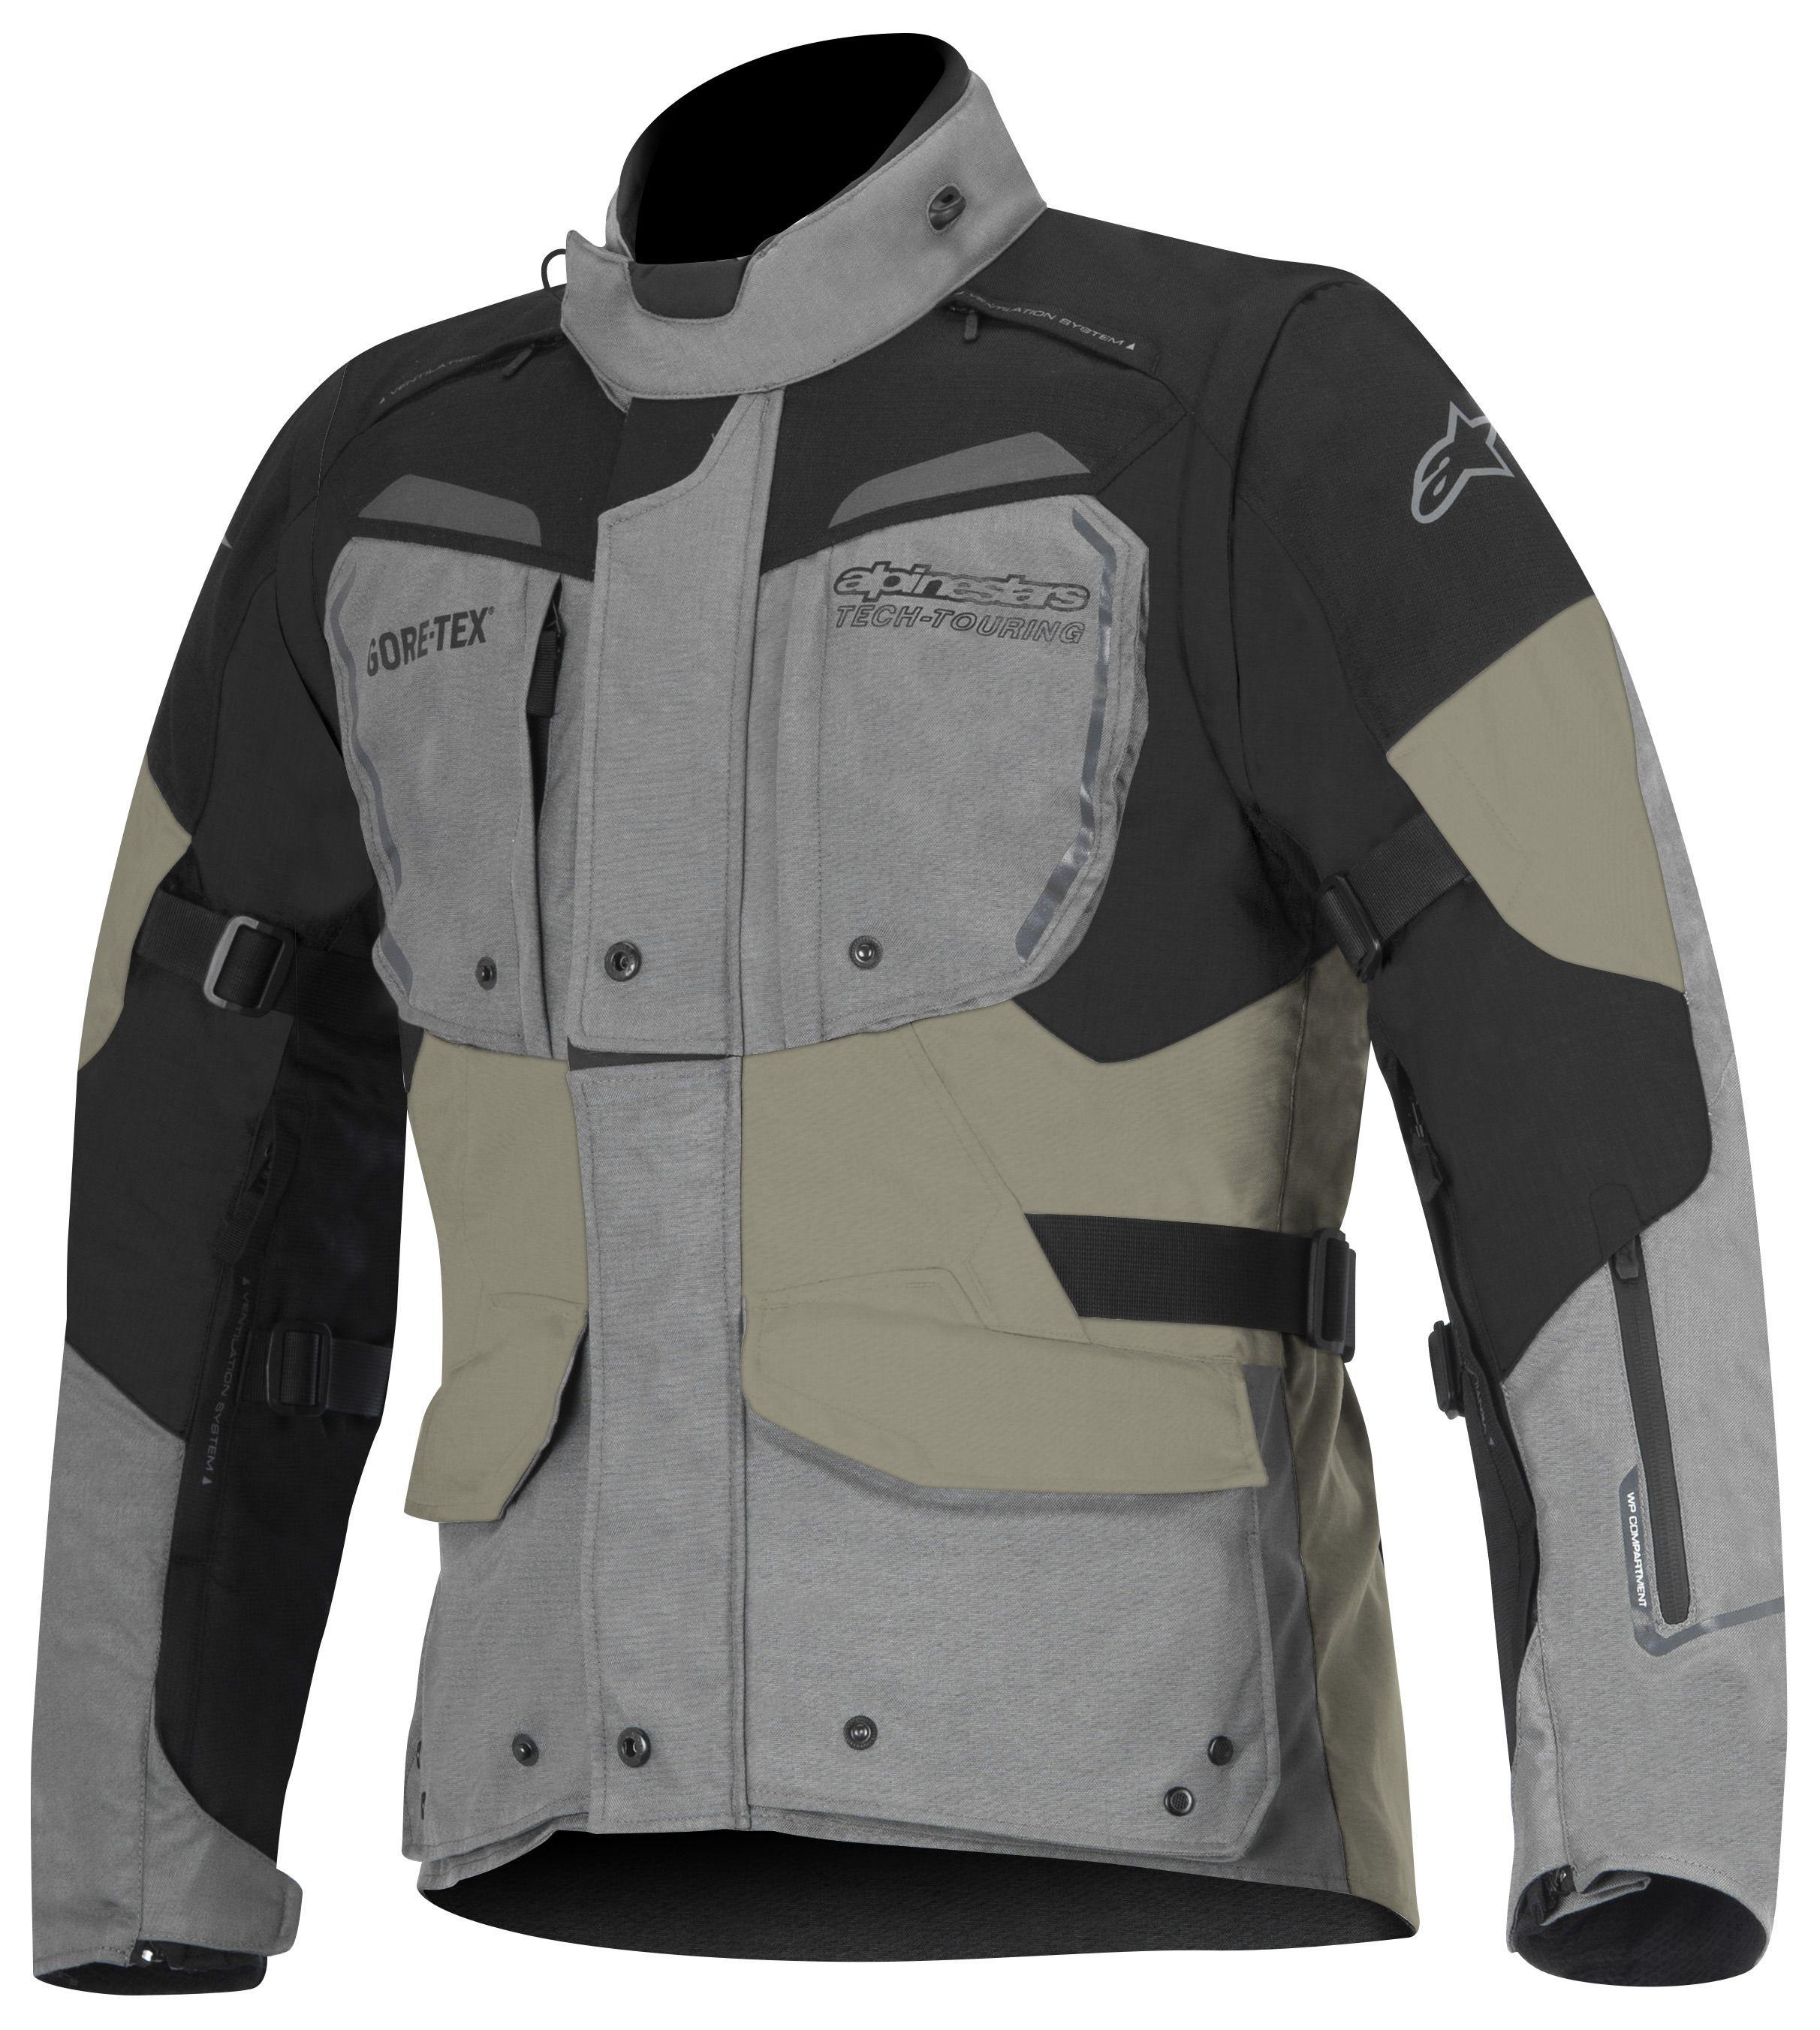 alpinestars durban gore tex jacket revzilla. Black Bedroom Furniture Sets. Home Design Ideas